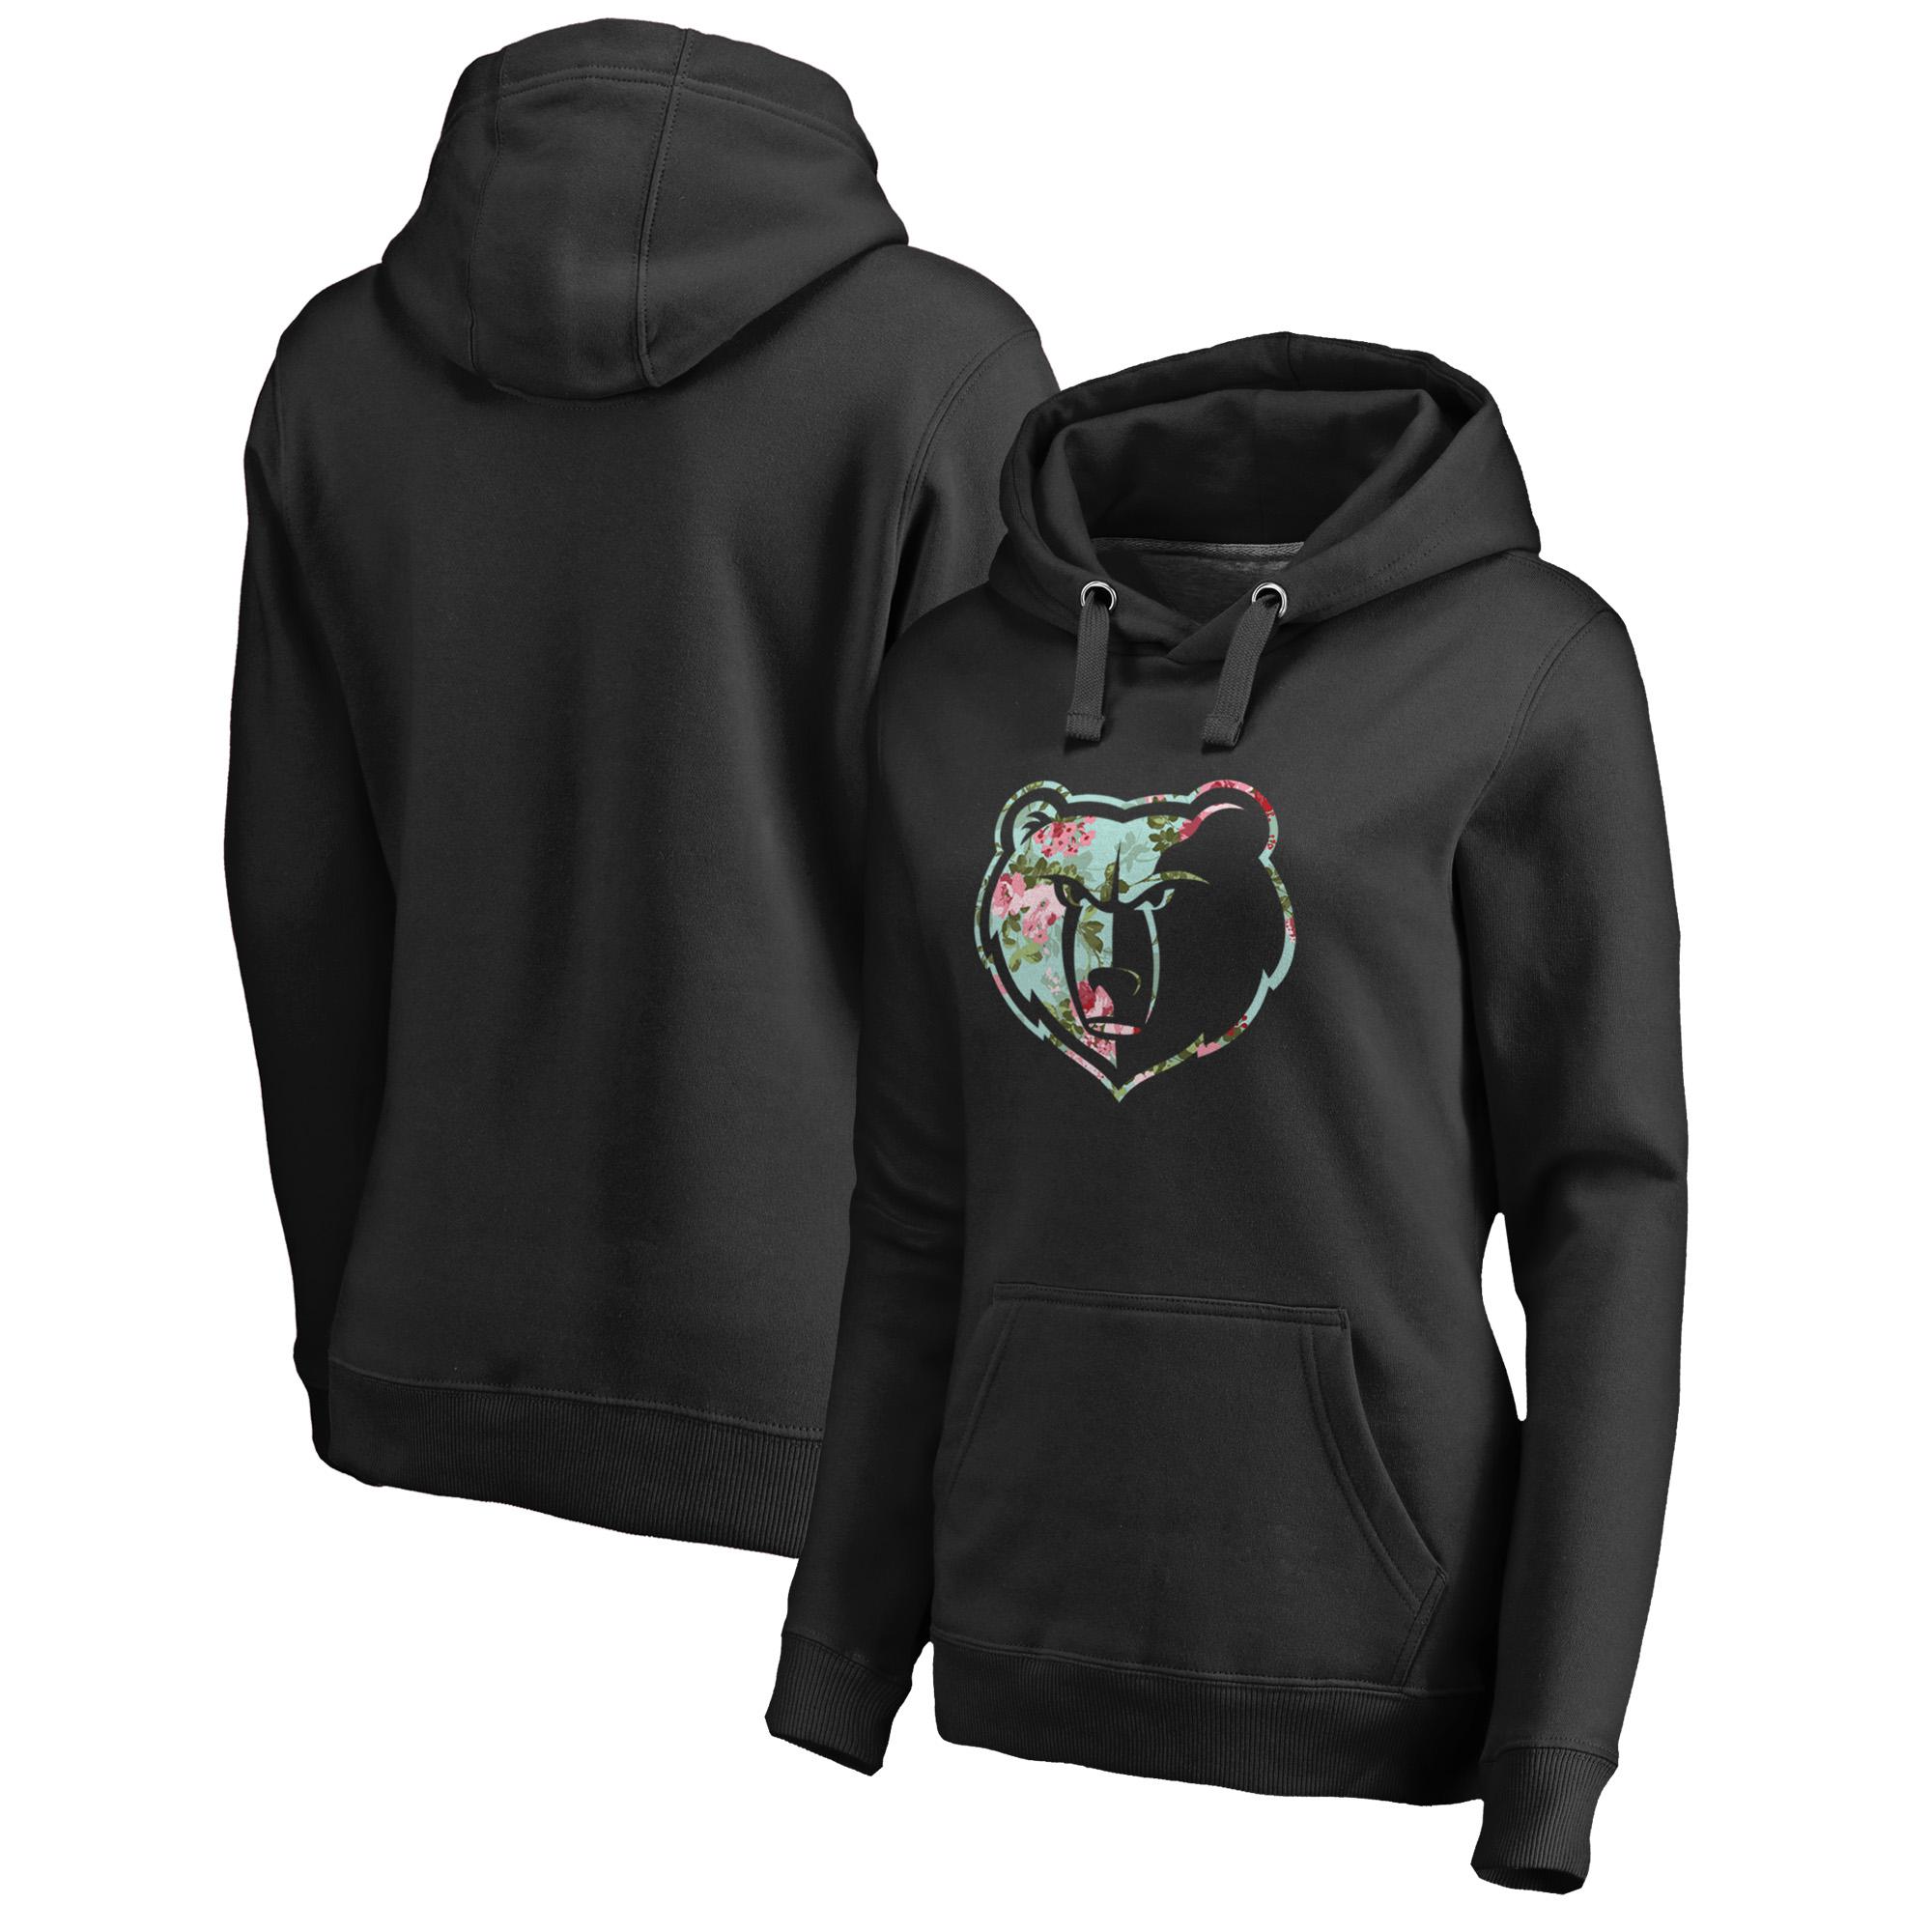 Memphis Grizzlies Fanatics Branded Women's Lovely Pullover Hoodie - Black